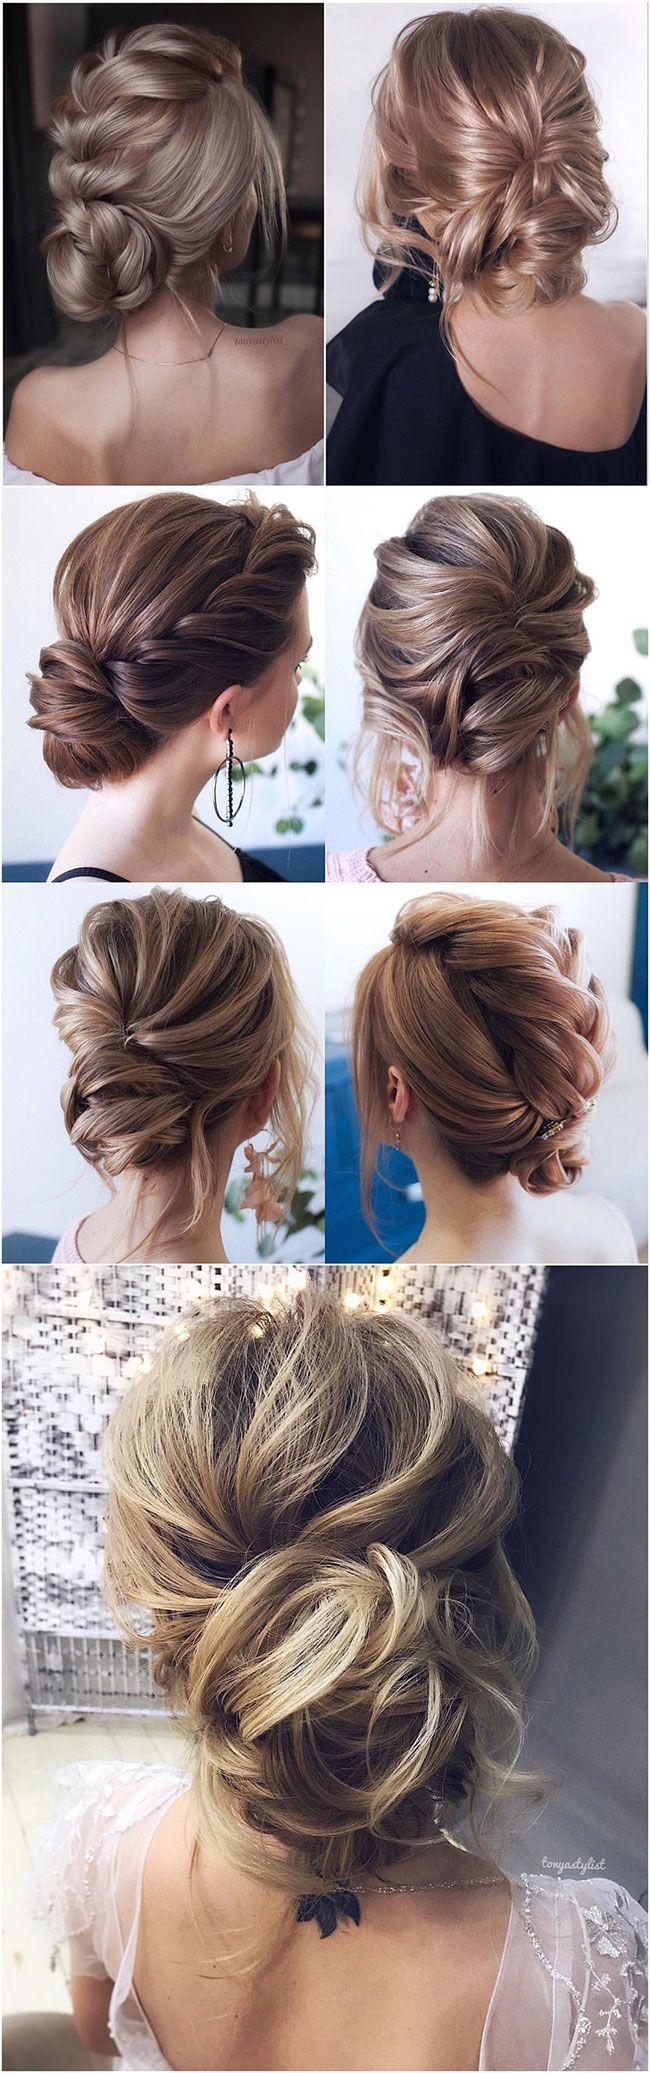 60+ Best Wedding Hairstyles from Tonyastylist for the Modern Bride - #weddings #...